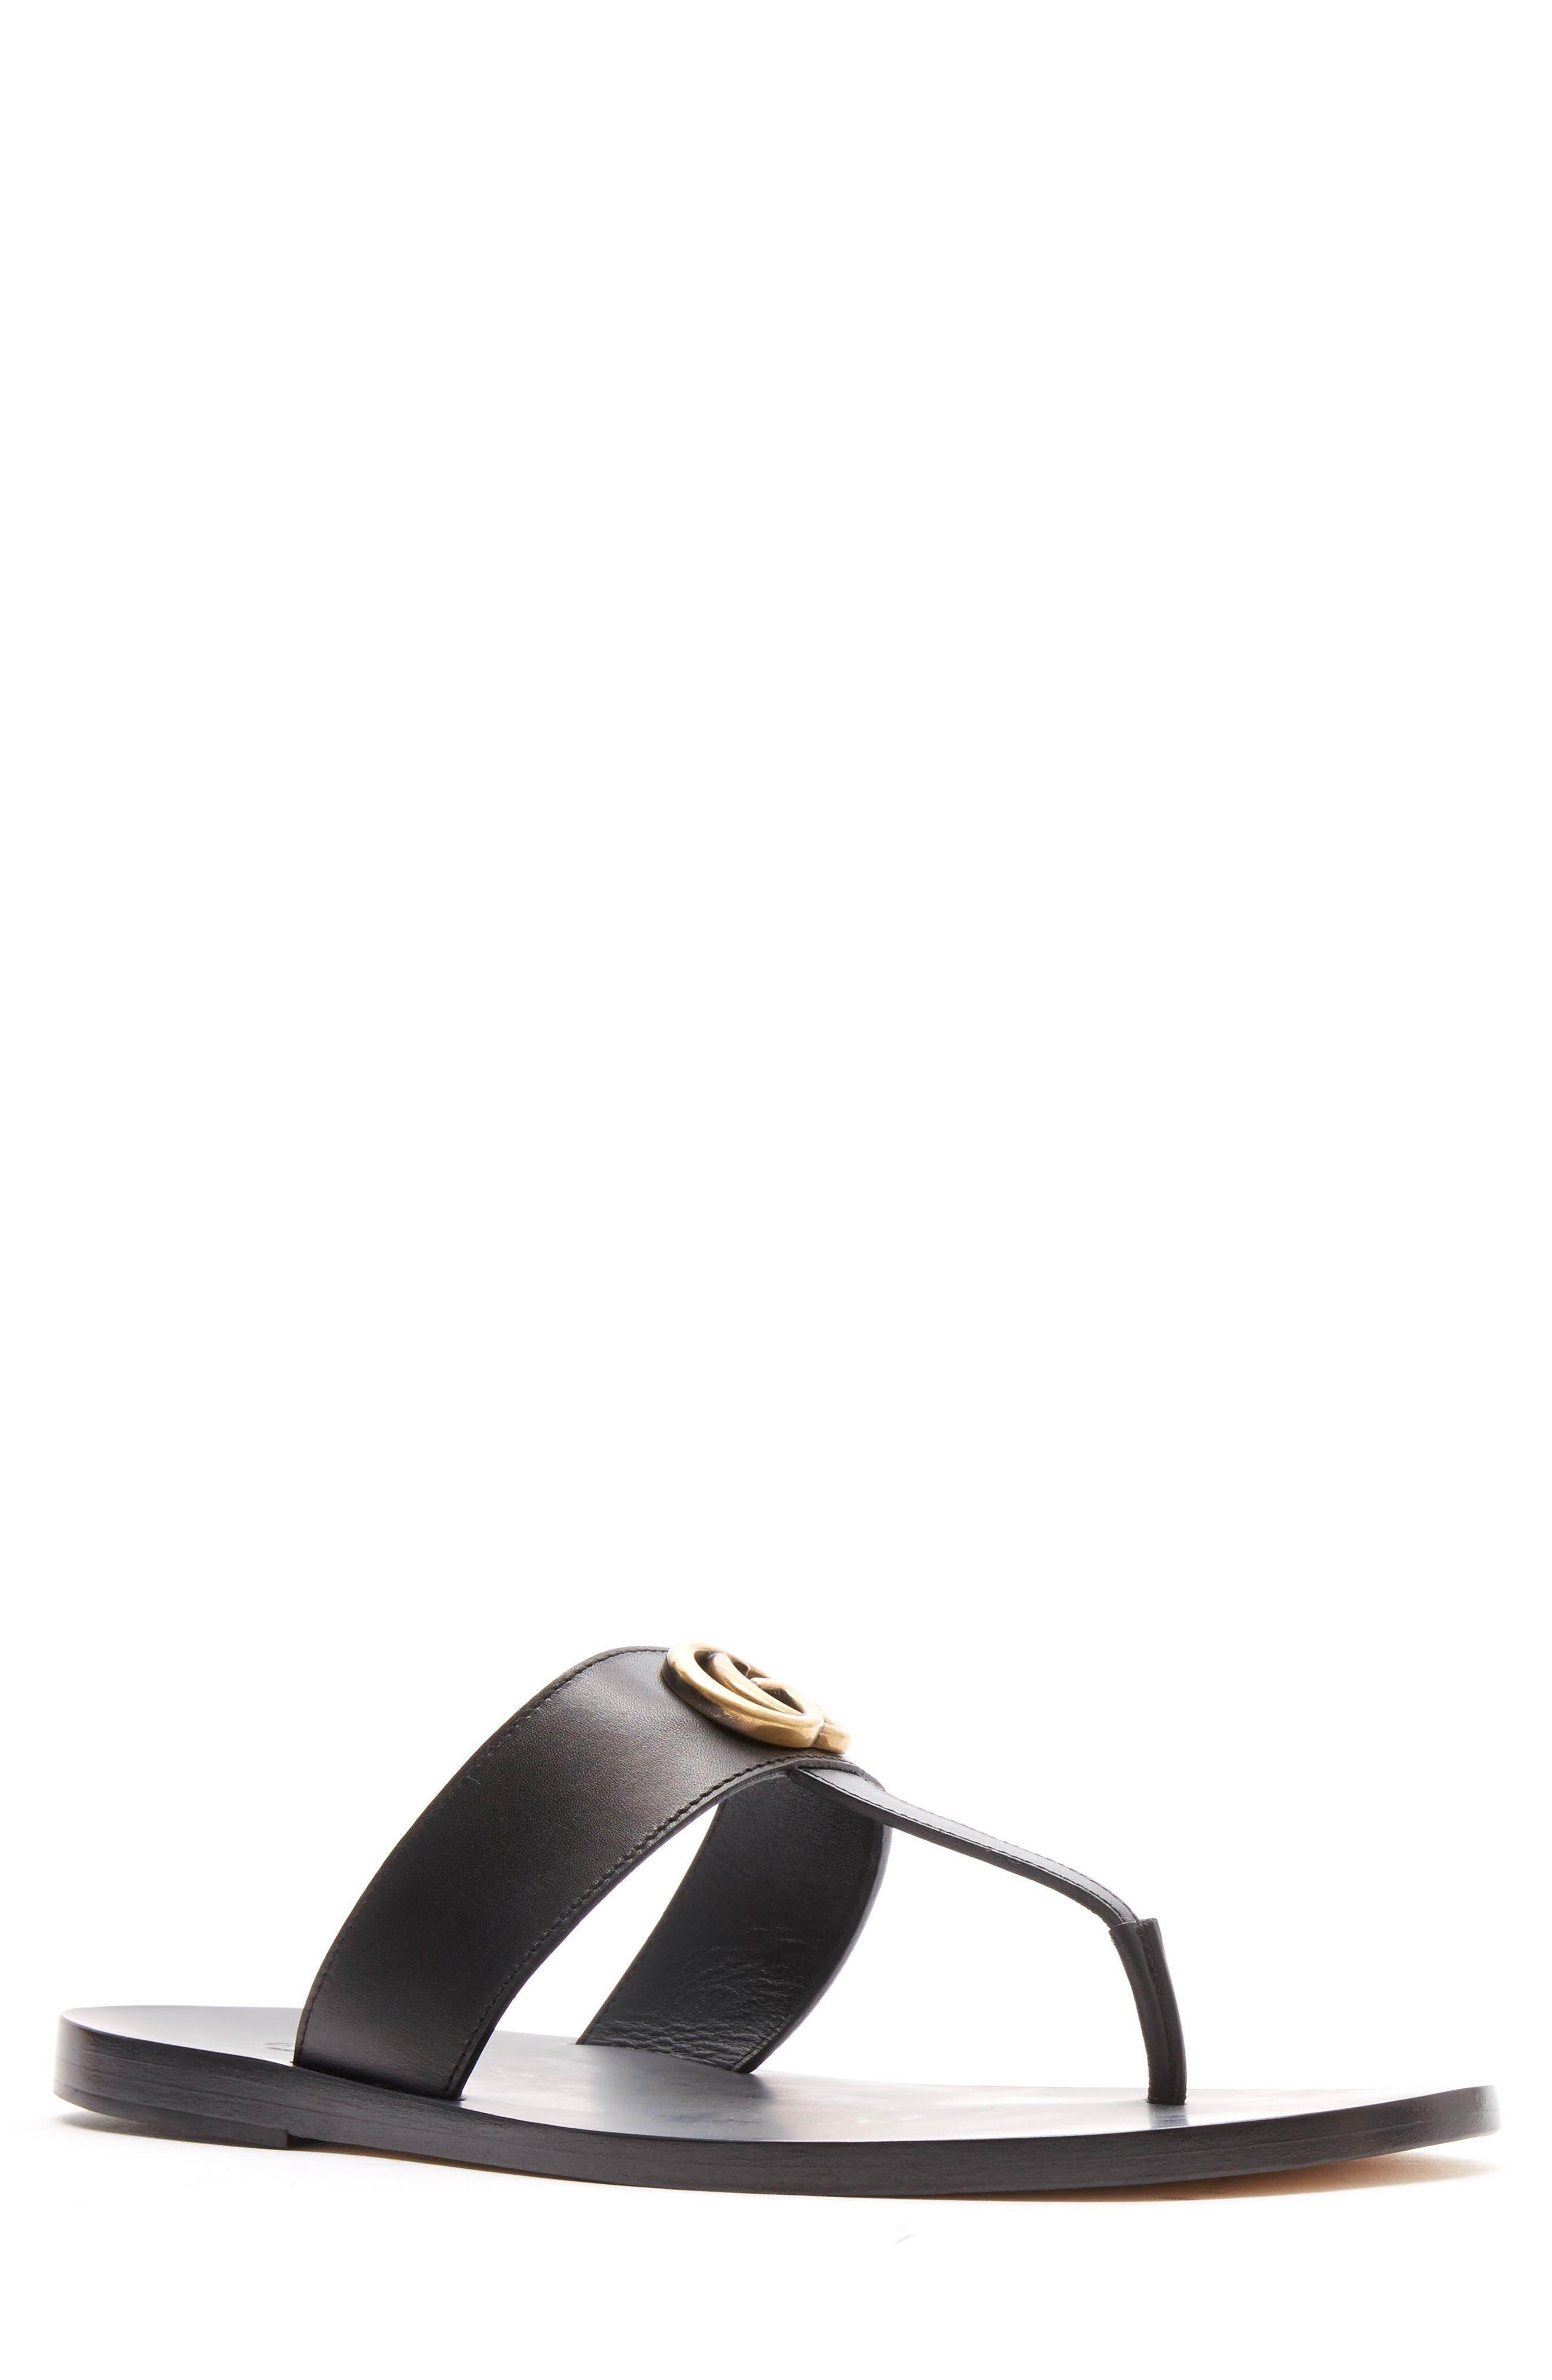 Alternate Image 1 Selected - Gucci Francis Marmont Flip Flop (Men)